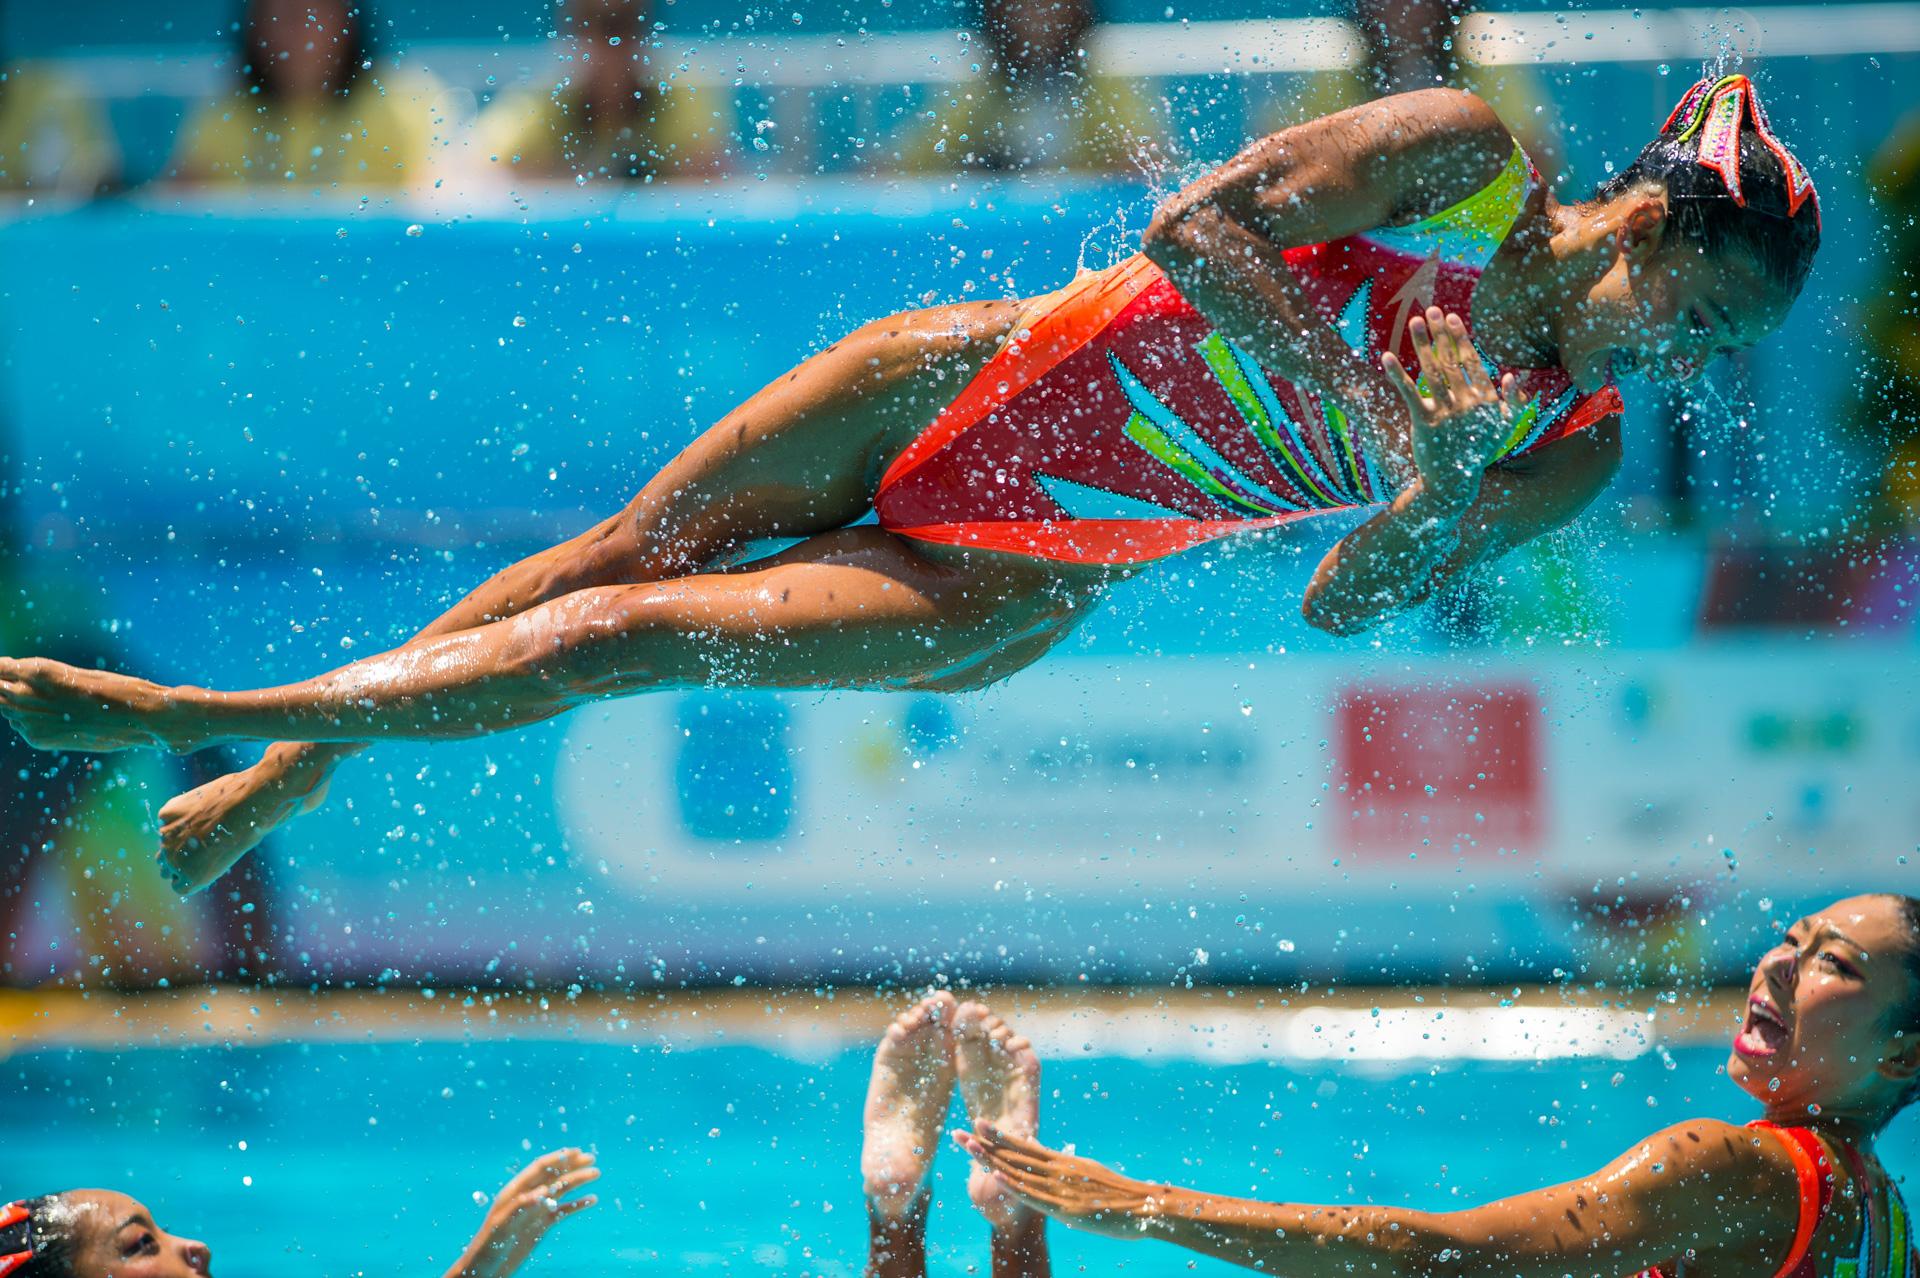 06/03/2016. Test-Event. Nado Sincronizado. Synchronised Swimming